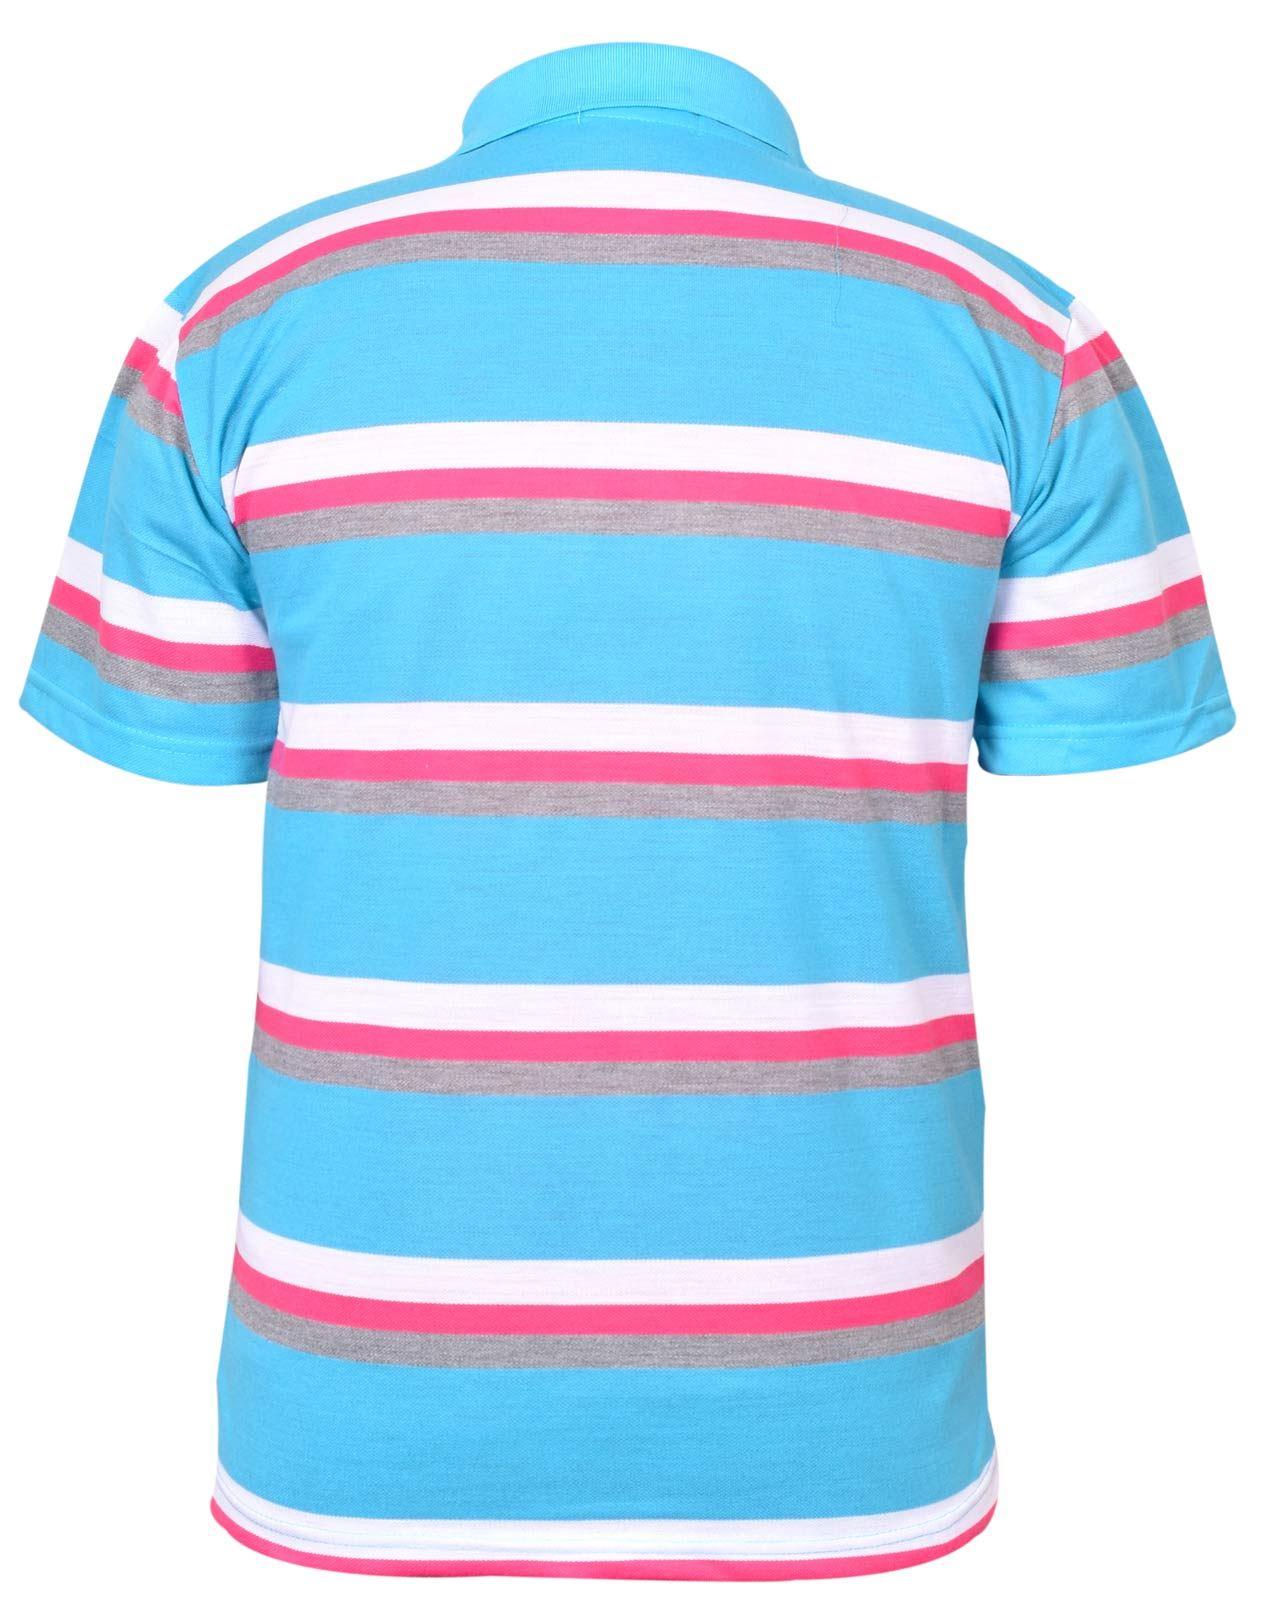 Mens-T-Shirts-Yarn-Dyed-Strip-Pocket-Polo-Shirt-Top-Multi-Colour-Size-M-3XL thumbnail 44